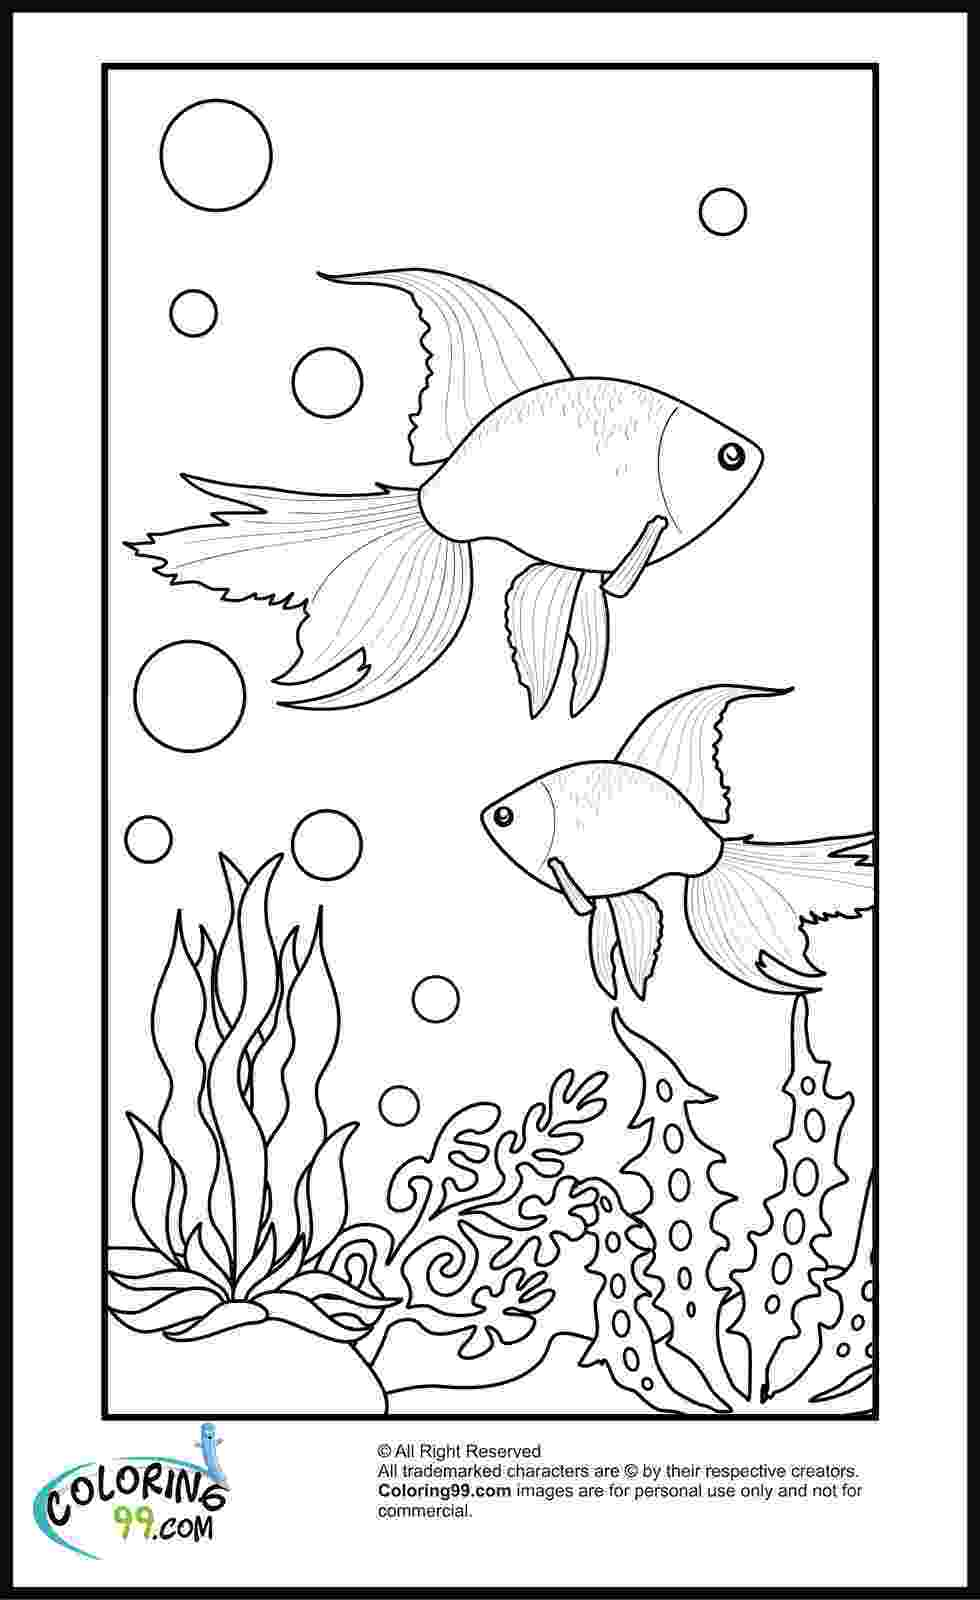 goldfish coloring page goldfish coloring pages download and print goldfish goldfish coloring page